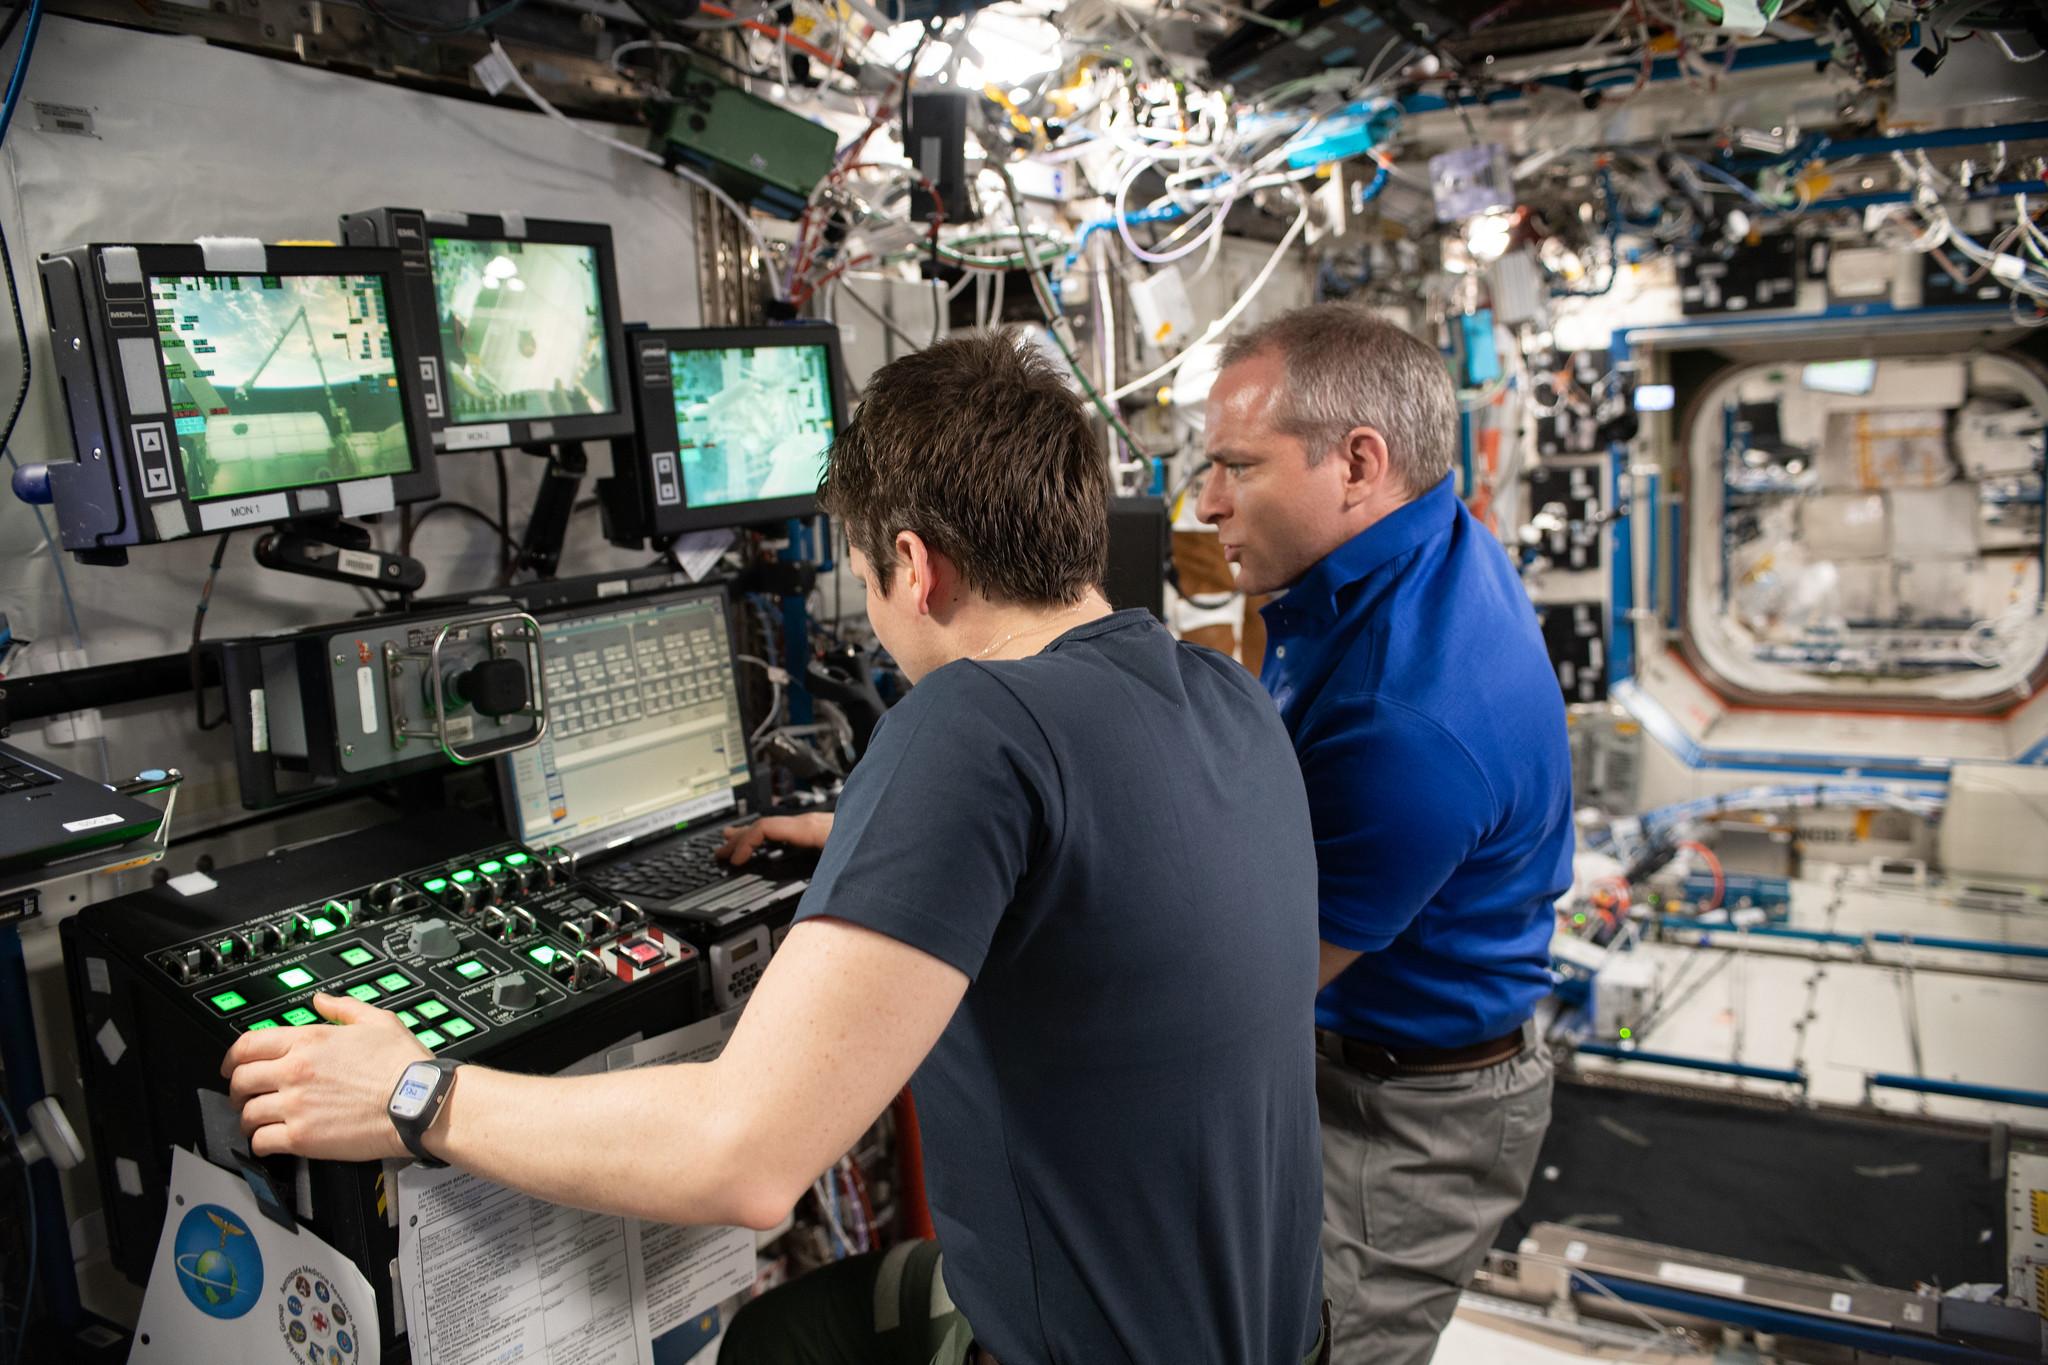 NASA astronaut Anne McClain and Canadian Space Agency astronaut David Saint-Jacques practice robotics maneuvers several days before the actual NG-11 Cygnus capture event. Credit: NASA